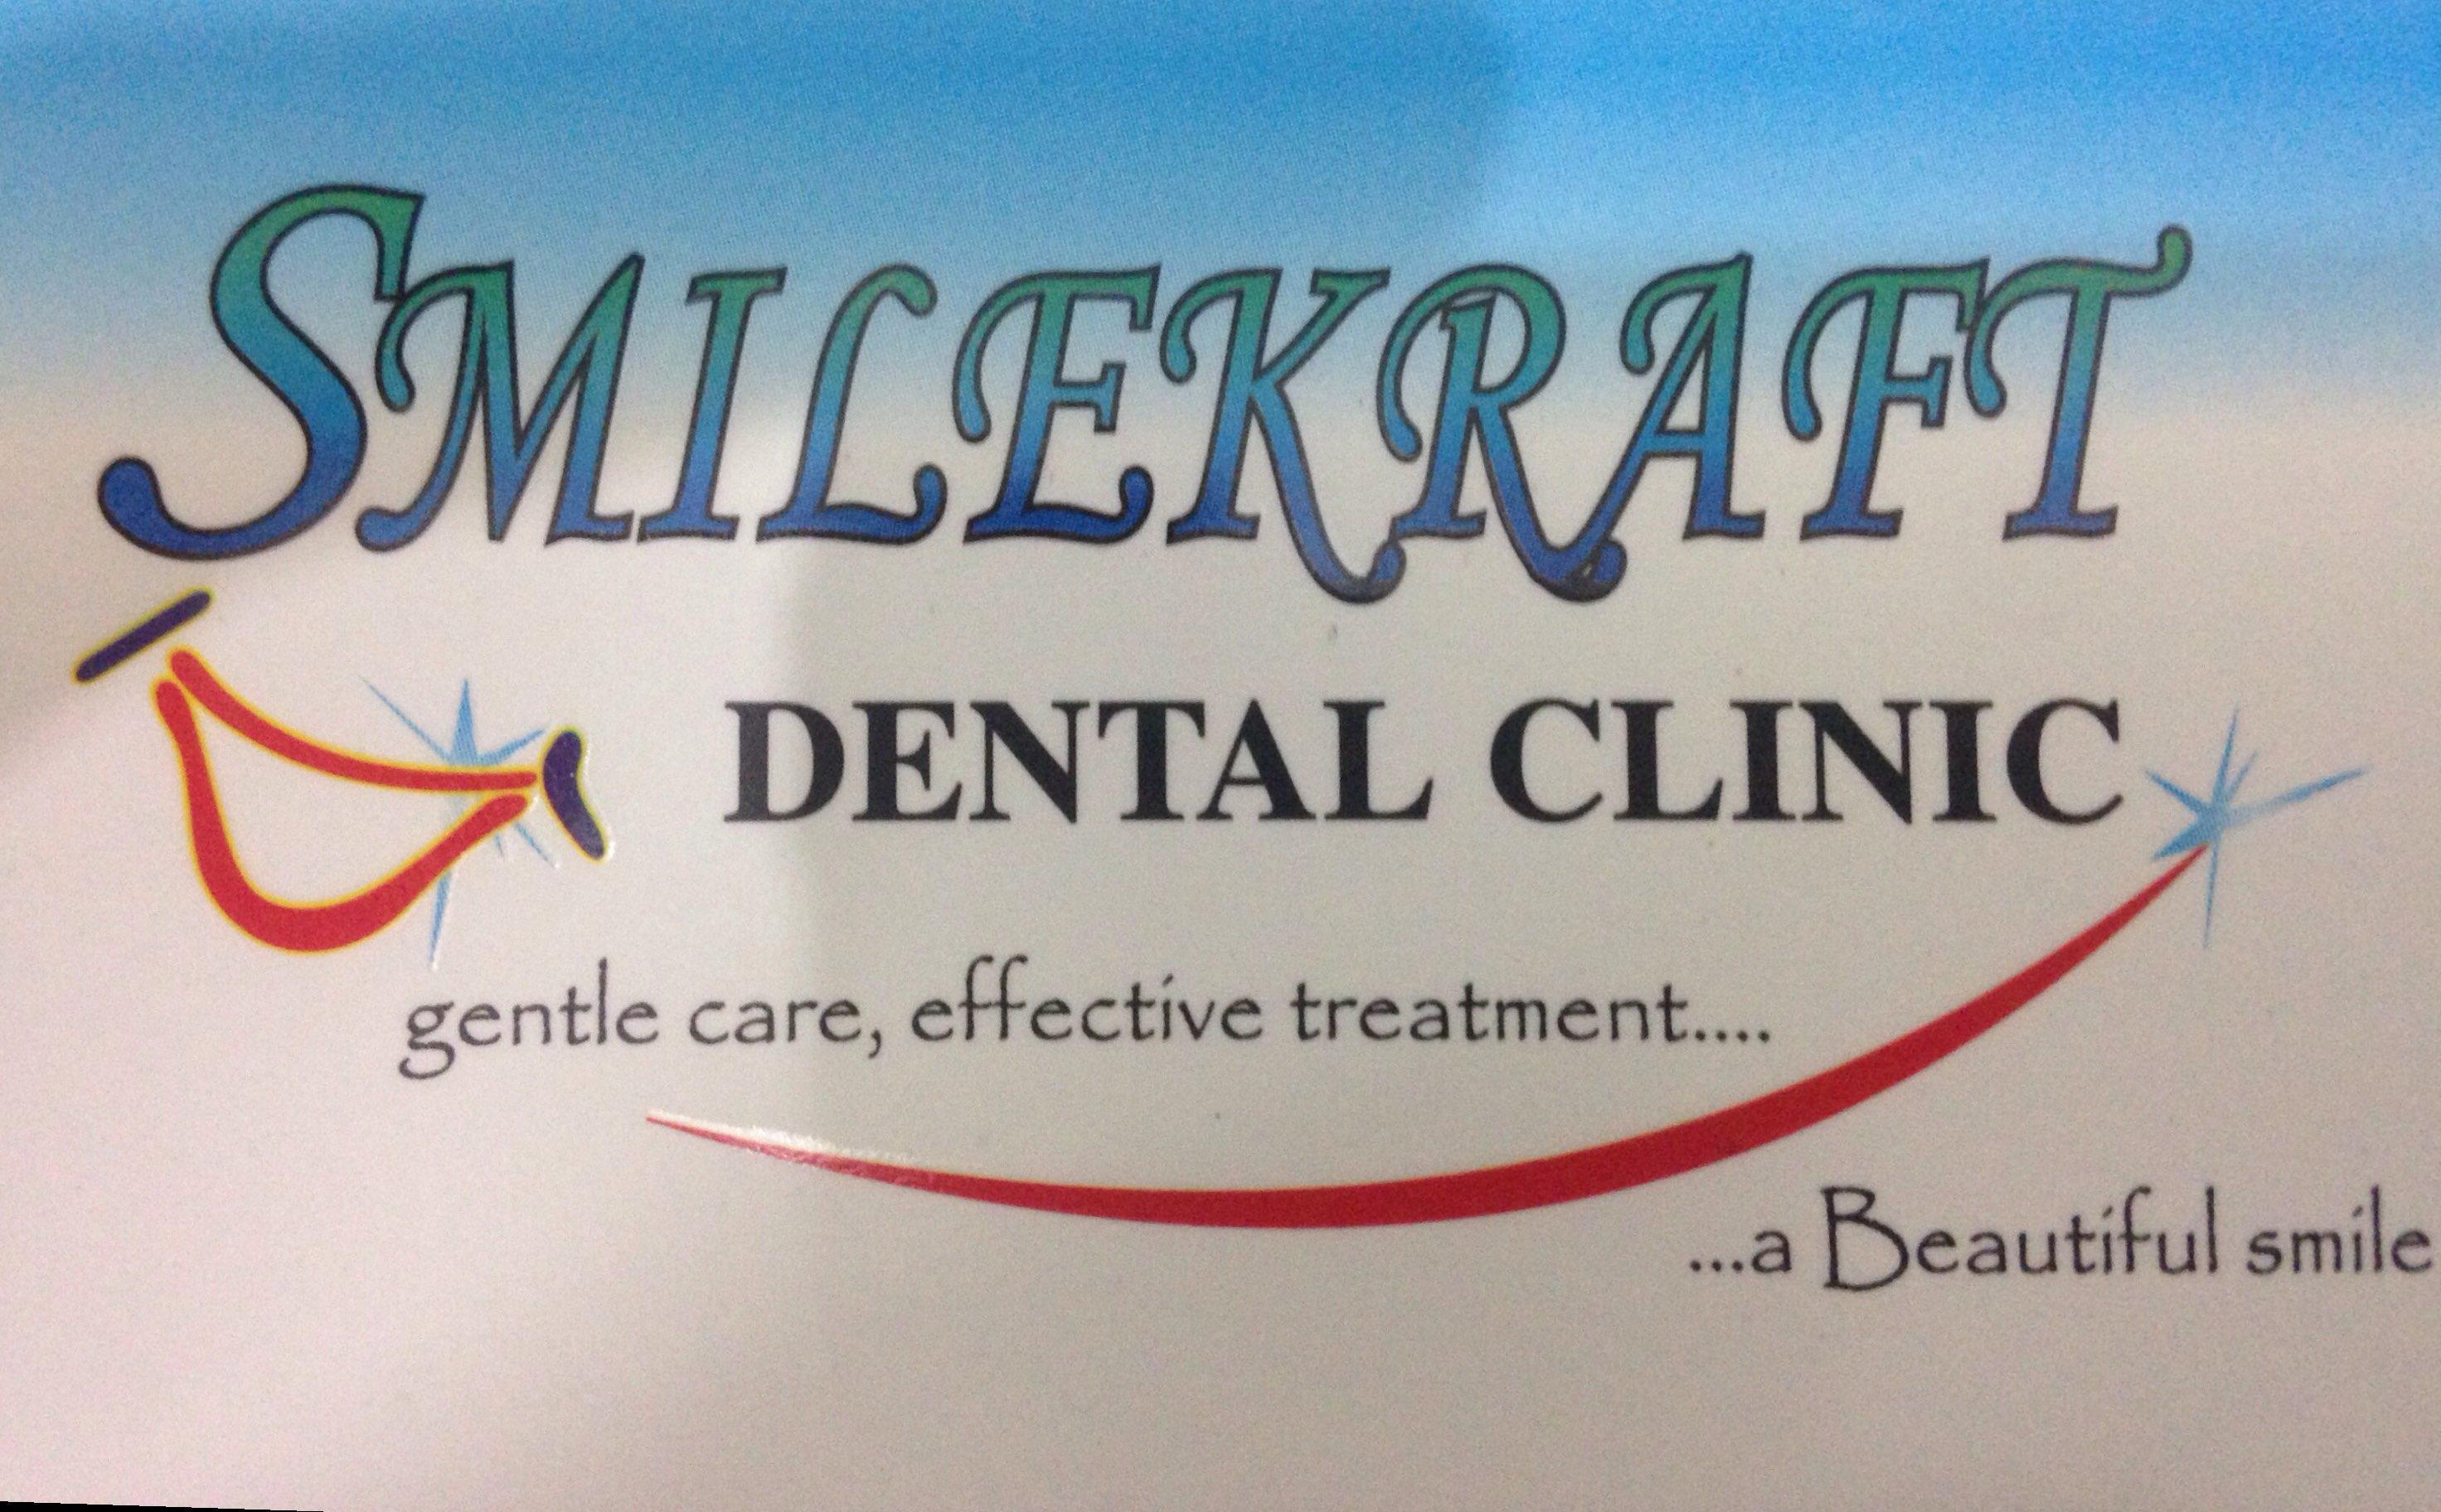 Smilekraft Dental Clinic